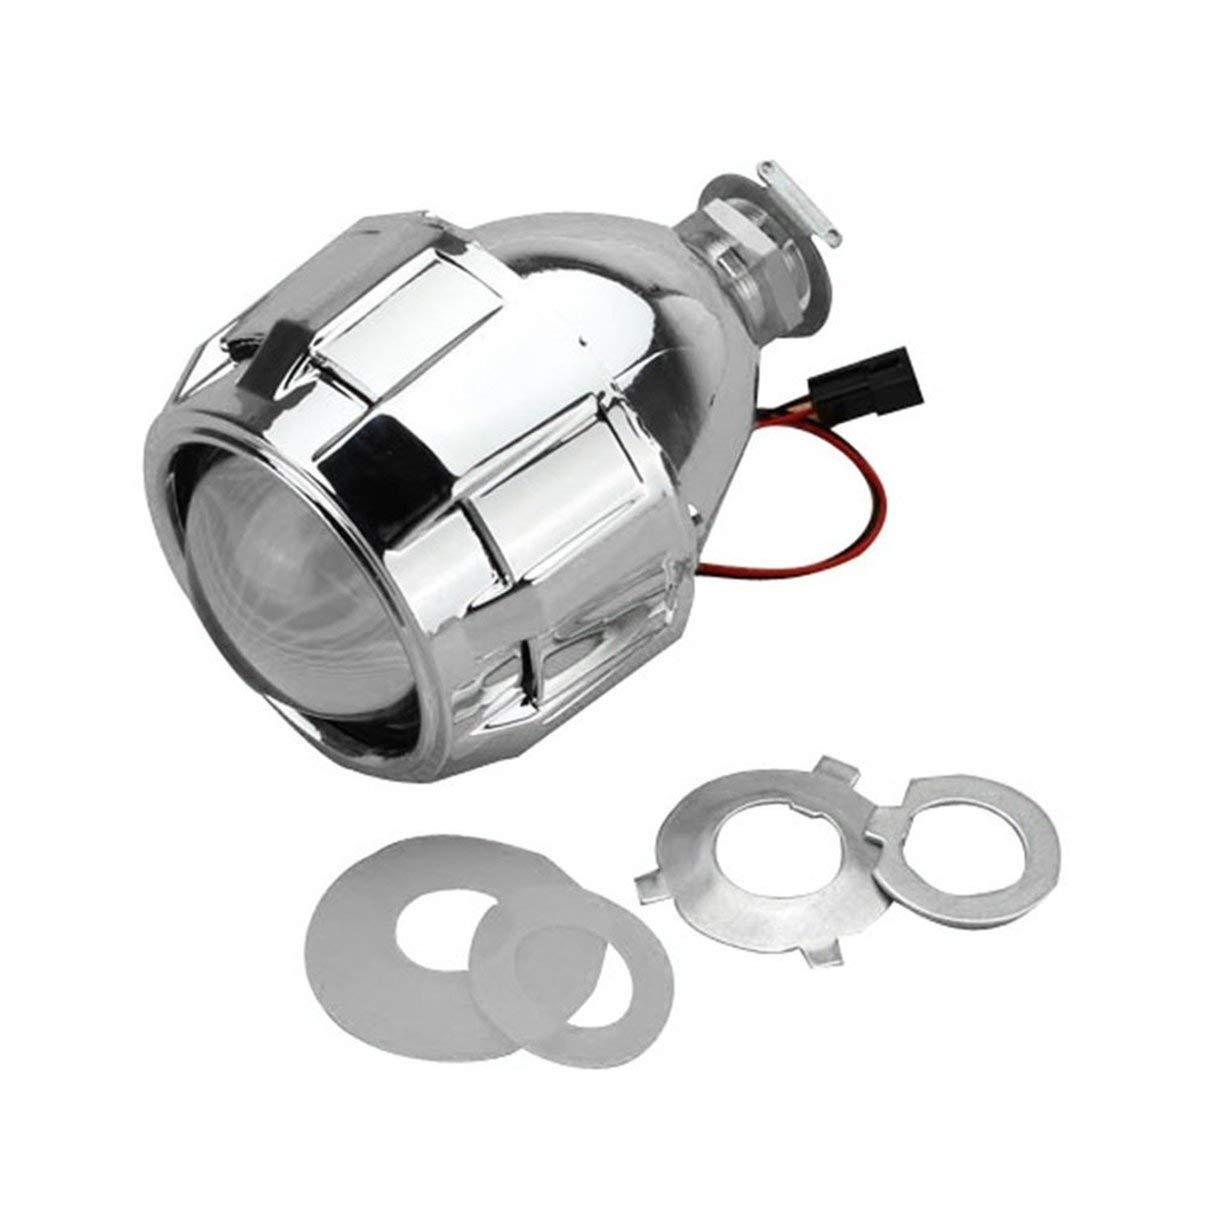 Mini-Bi-Xenon-Projektor-Objektiv, 2,5-Zoll-Xenon Mini Bi-Xenon HID Klar Projektorobjektiv Cover Shroud Scheinwerfer Custom Scheinwerfer H1 H4 H7 Silber Wafalano